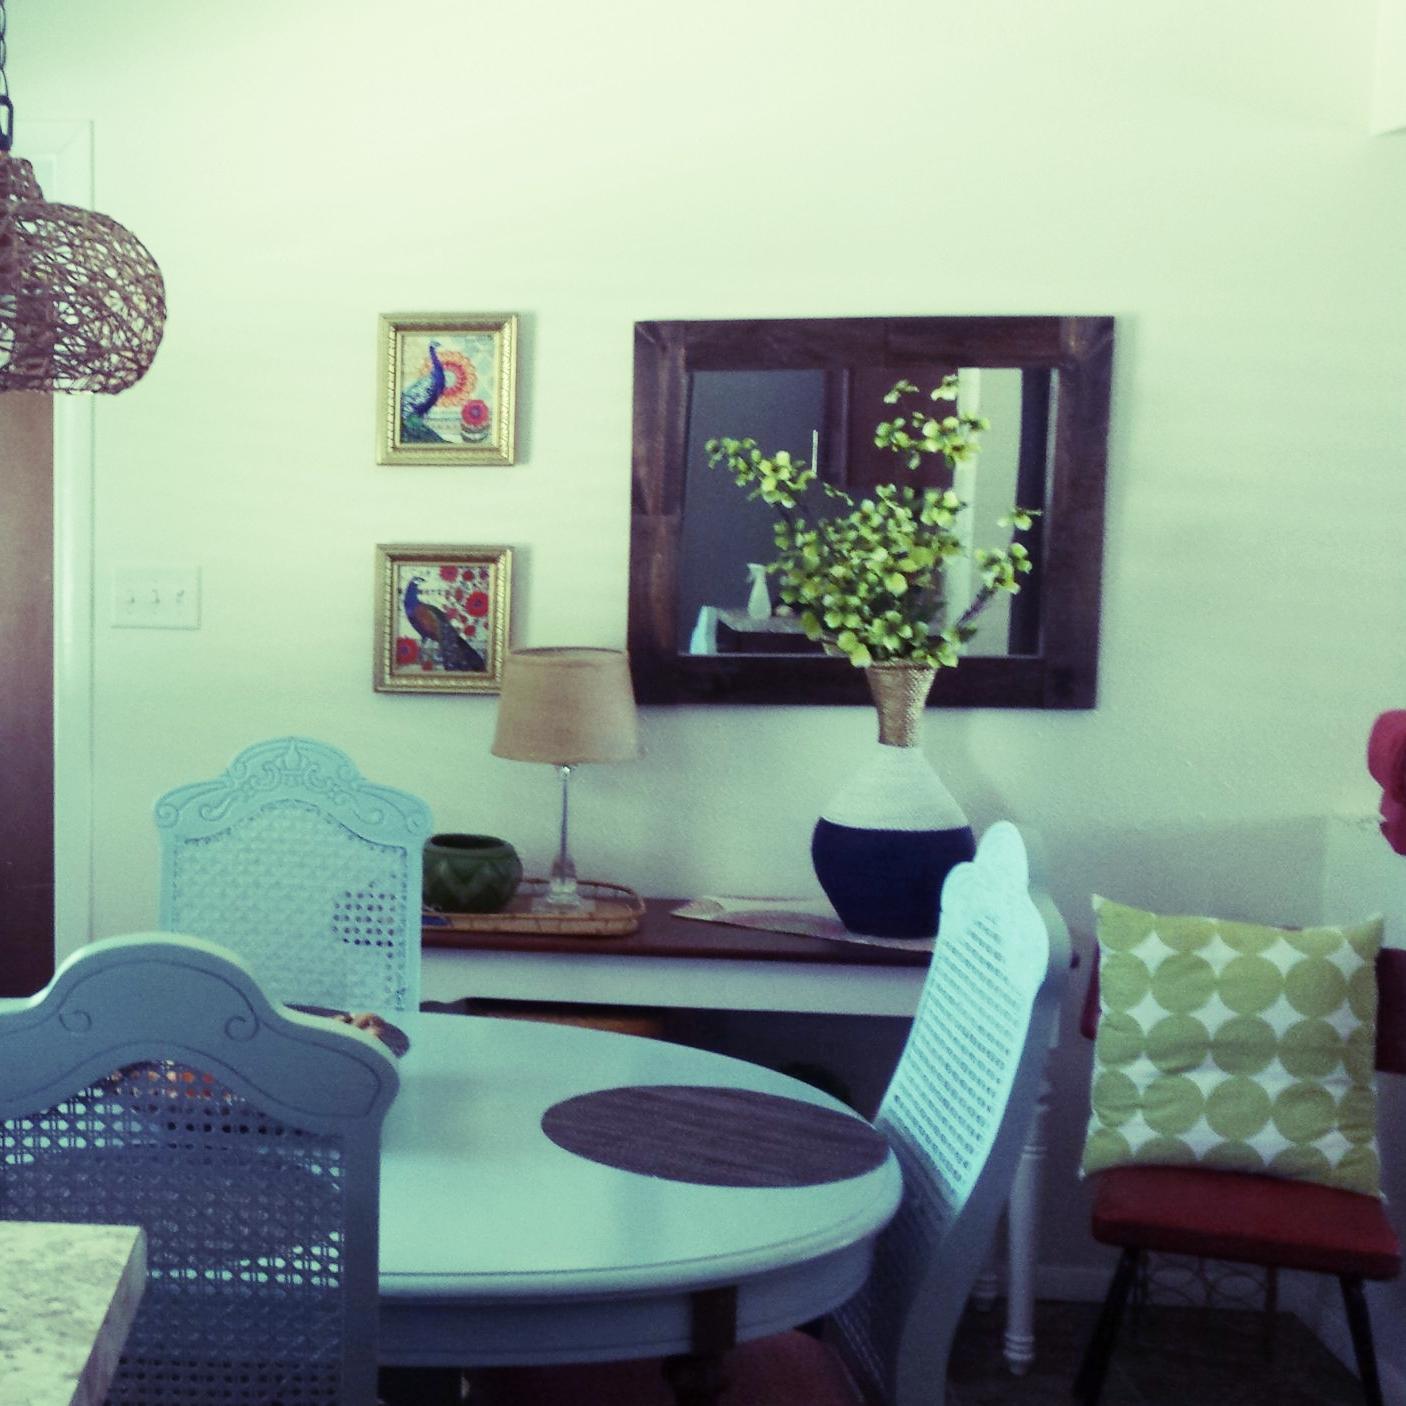 kitchendecor.jpg